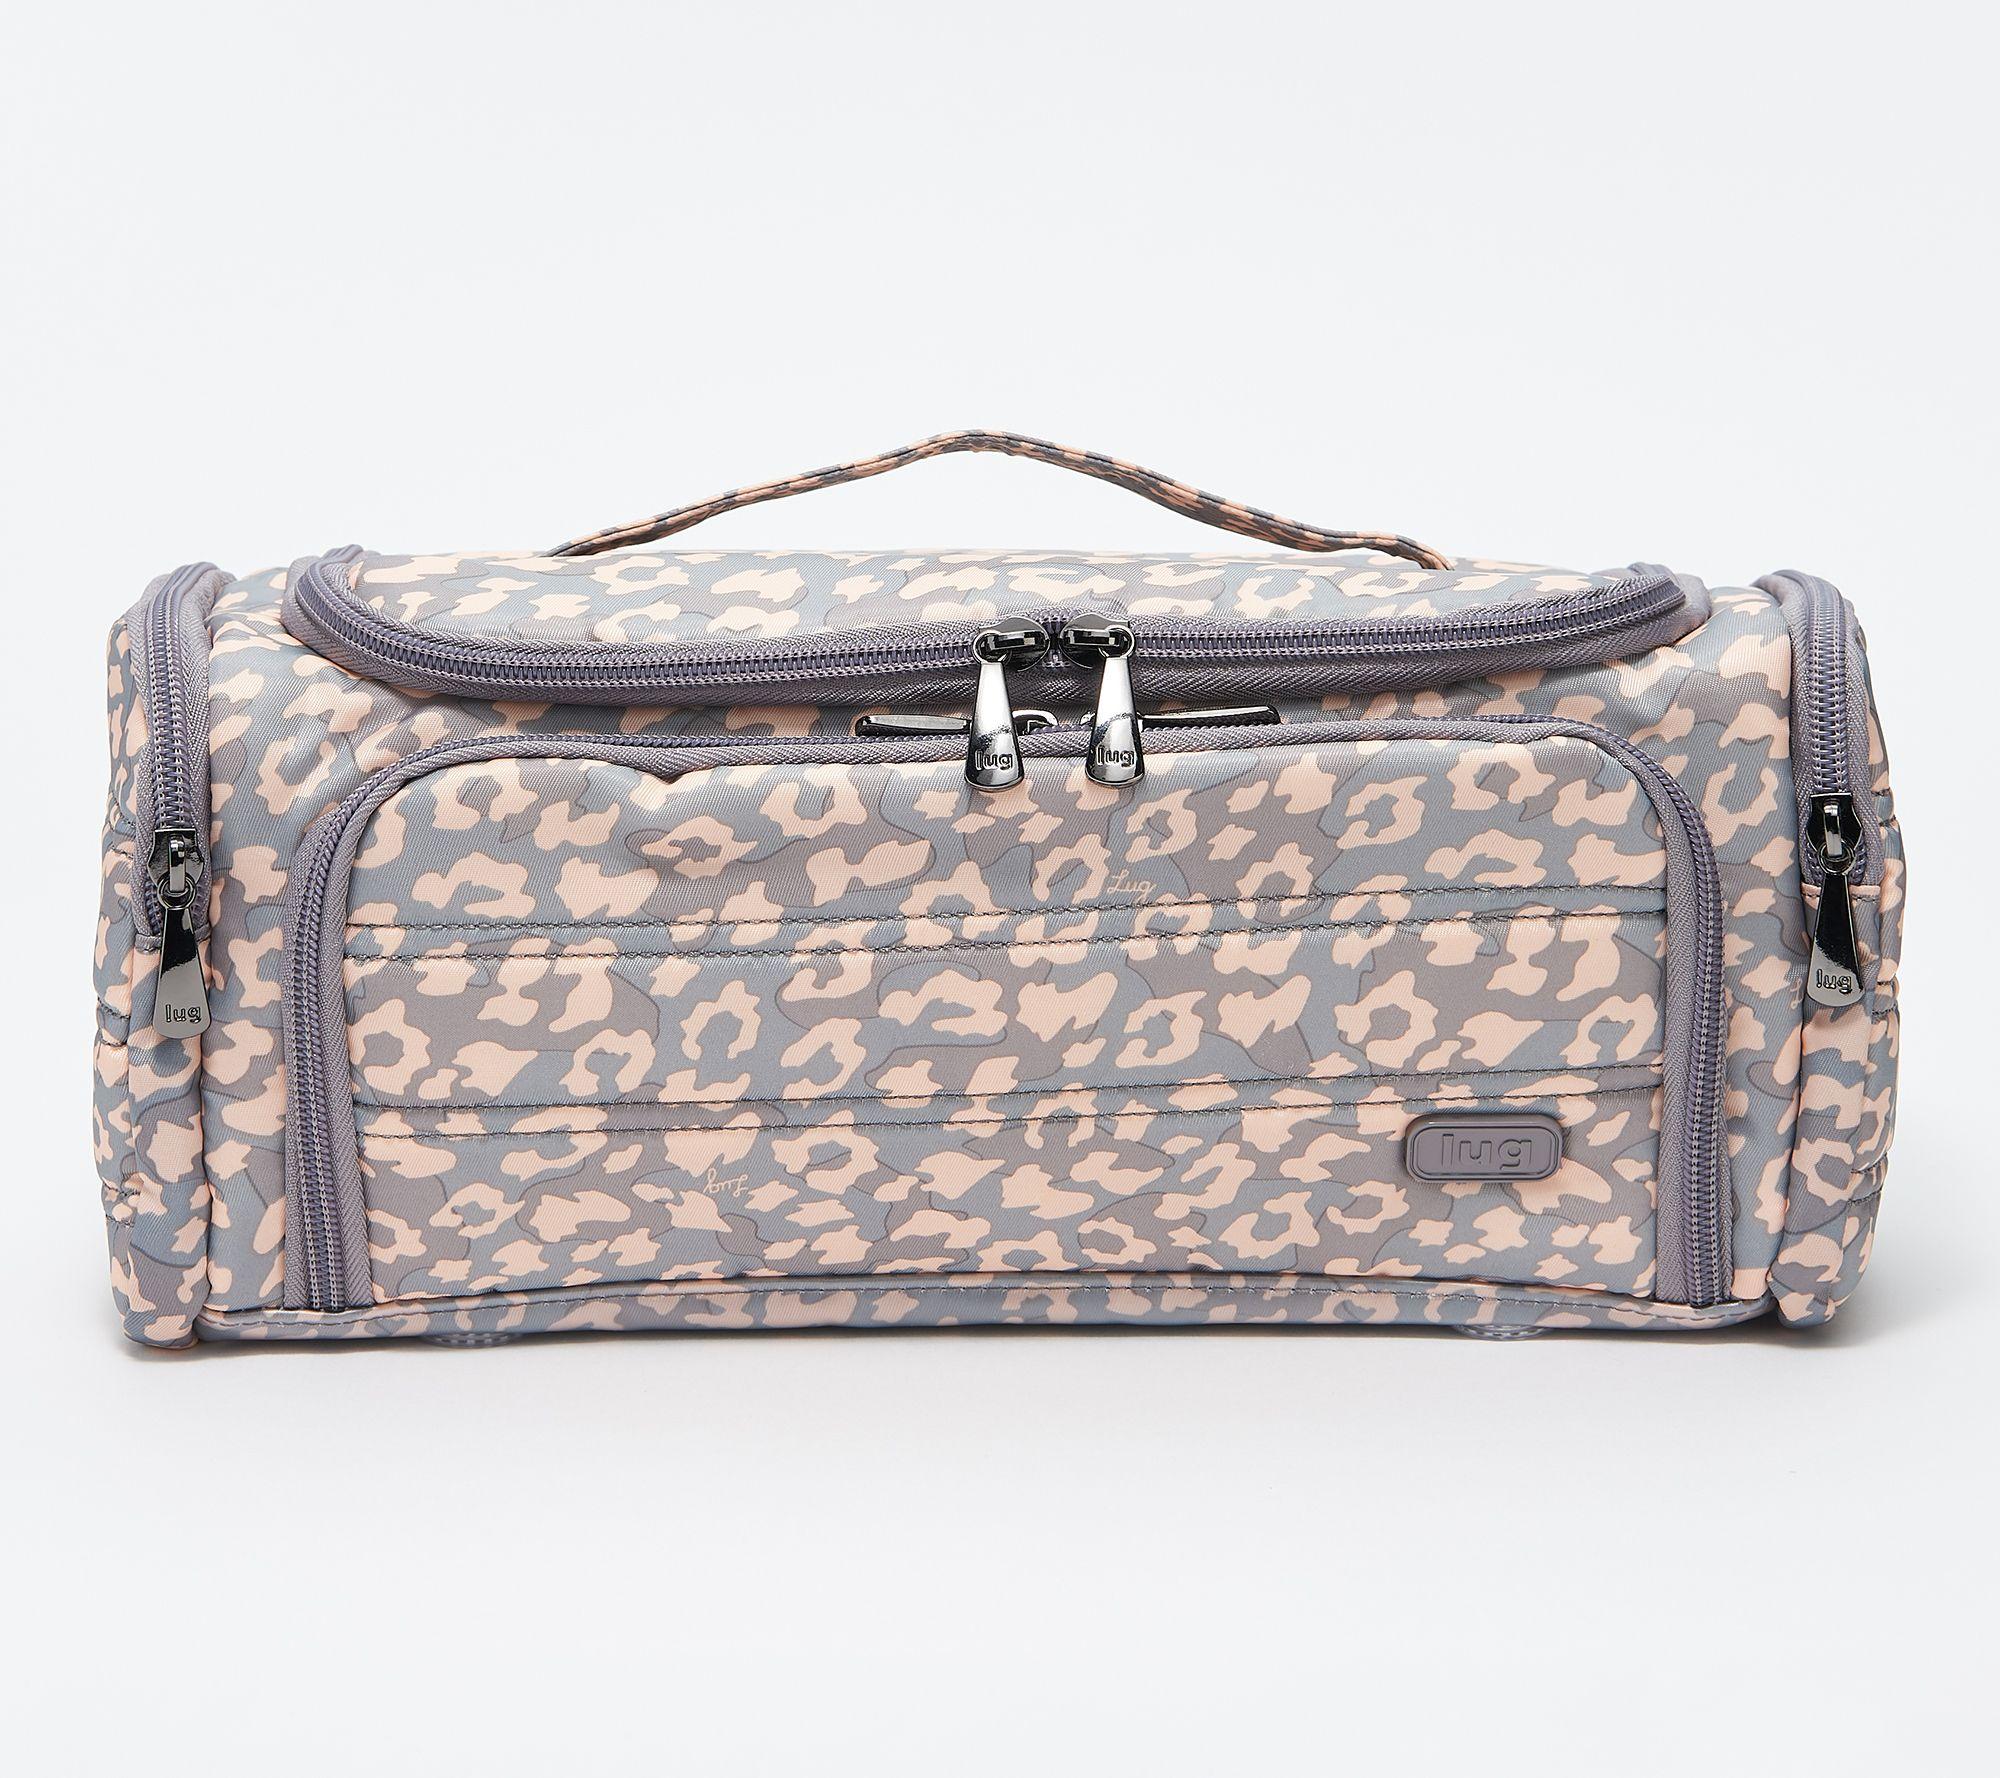 SCDS Elephant PU Leather Lady Handbag Tote Bag Zipper Shoulder Bag